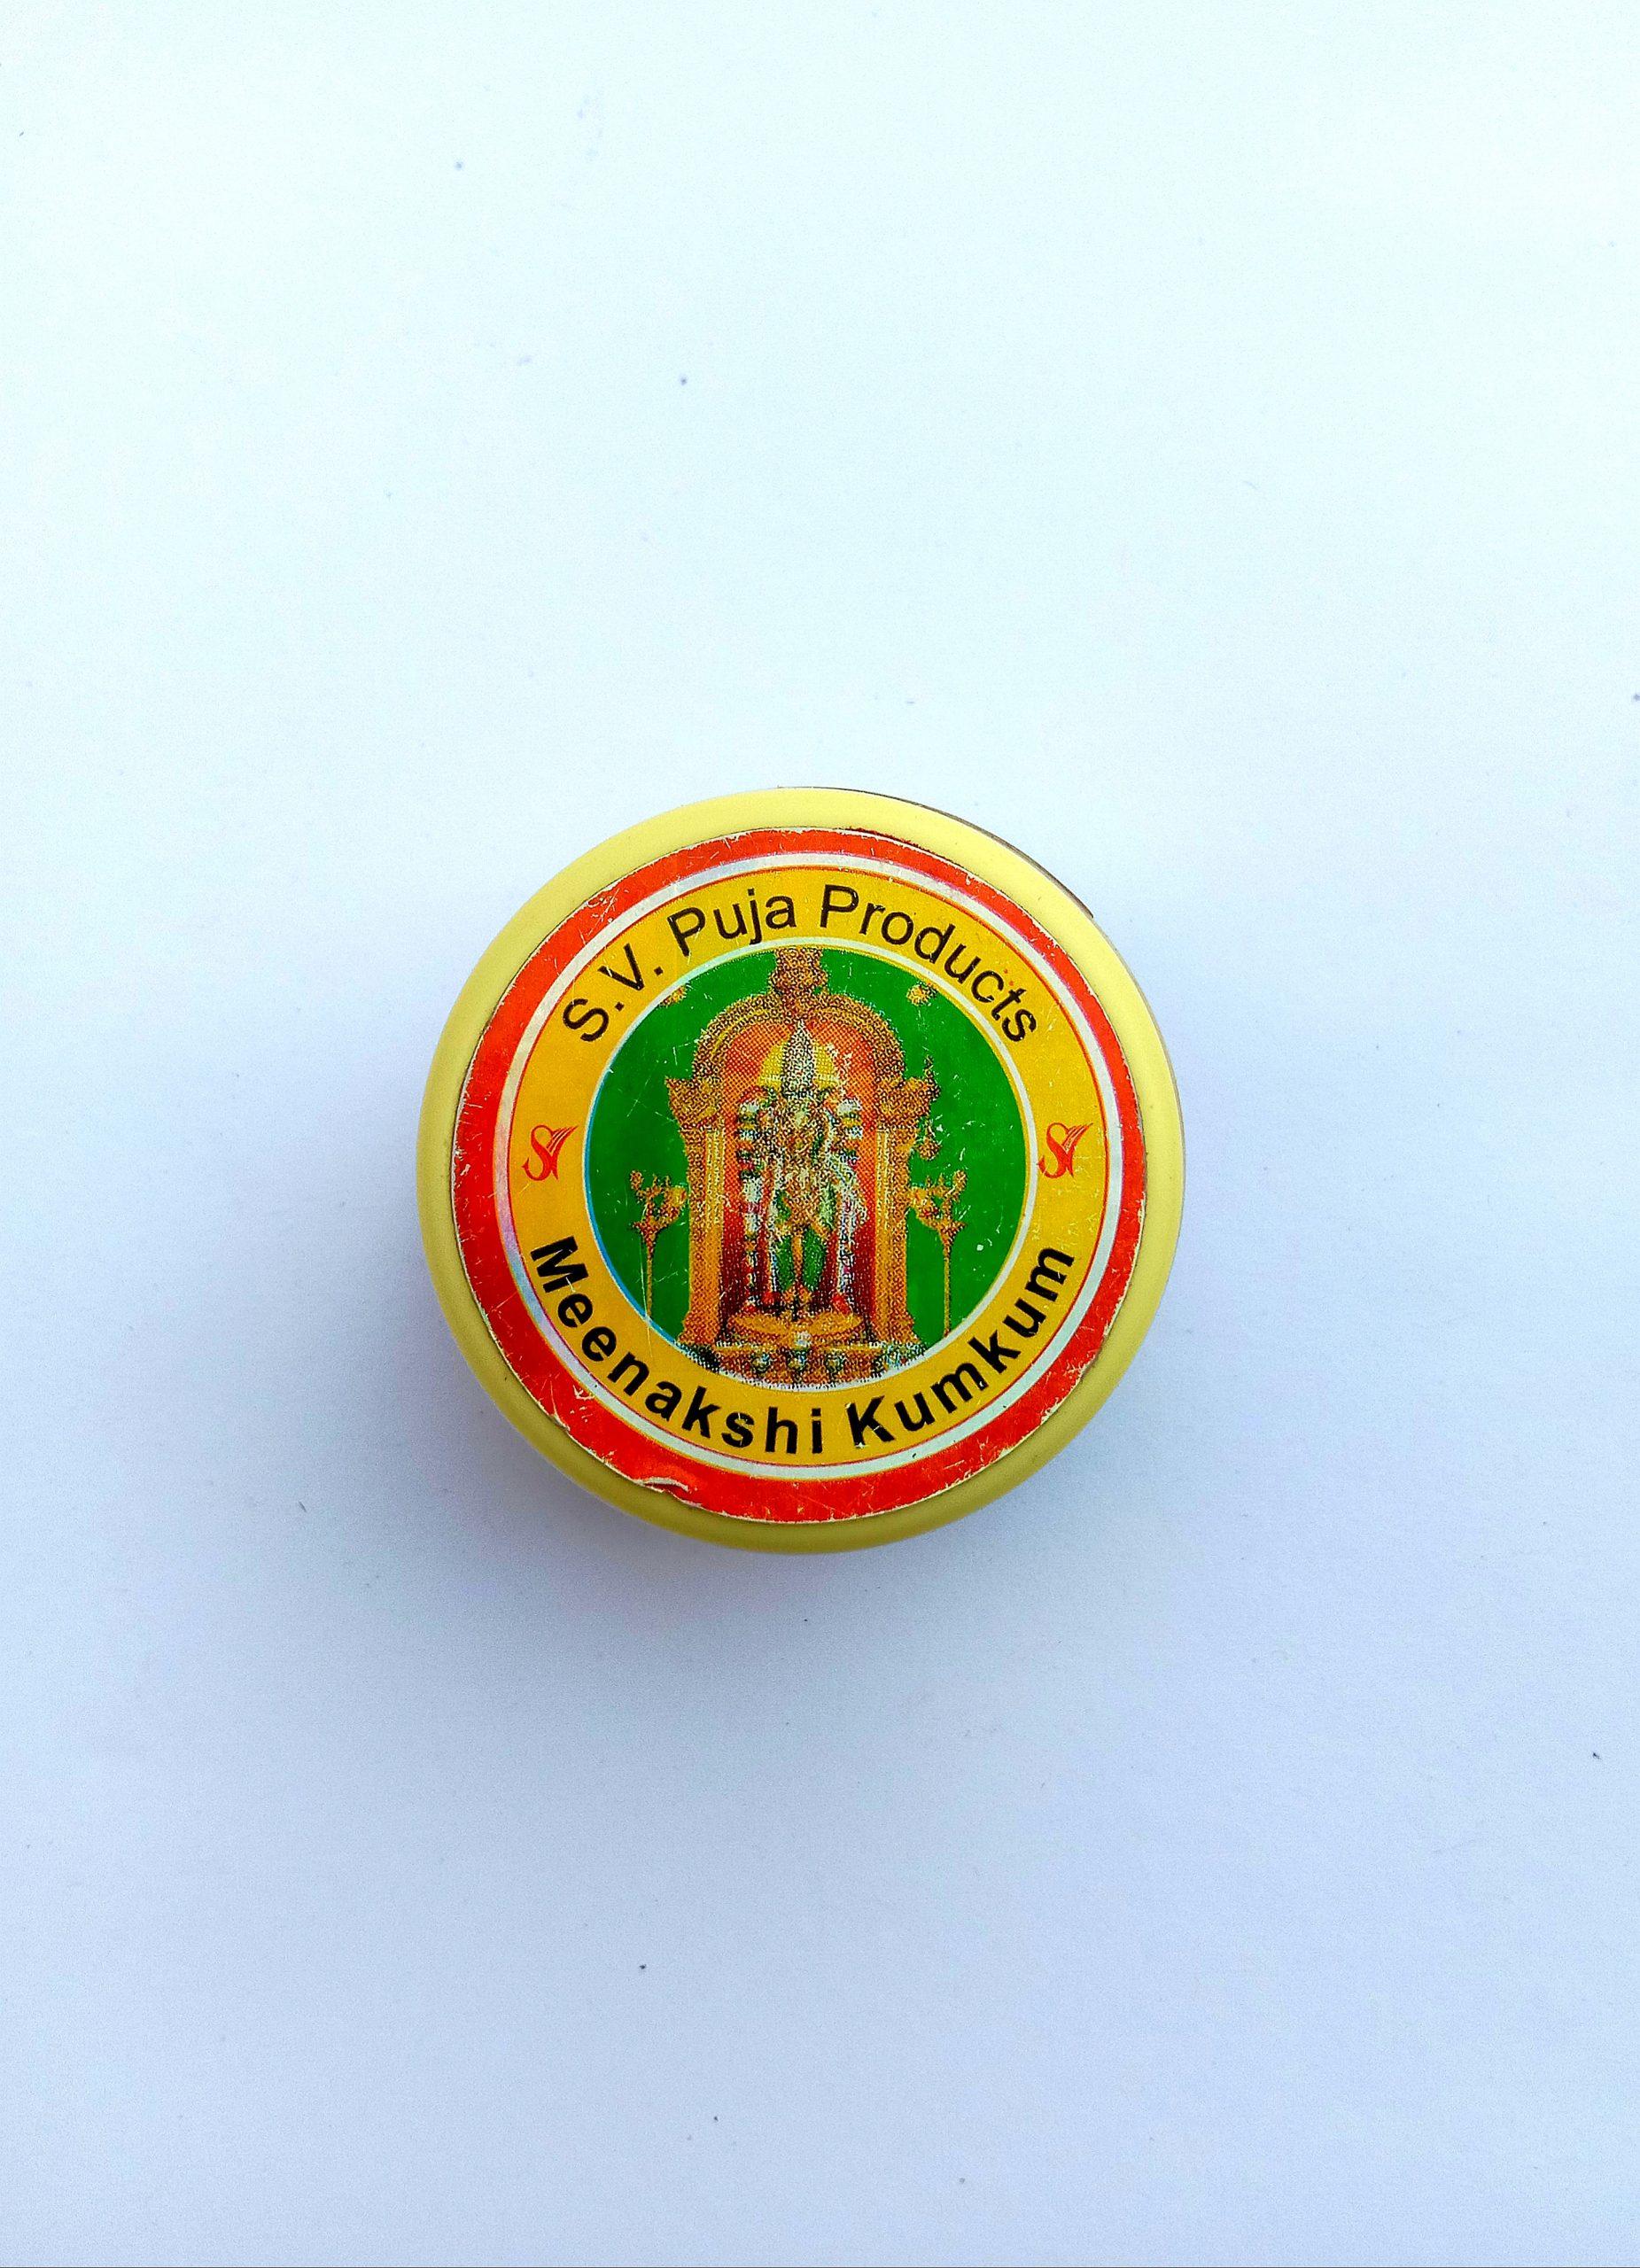 A circular pack